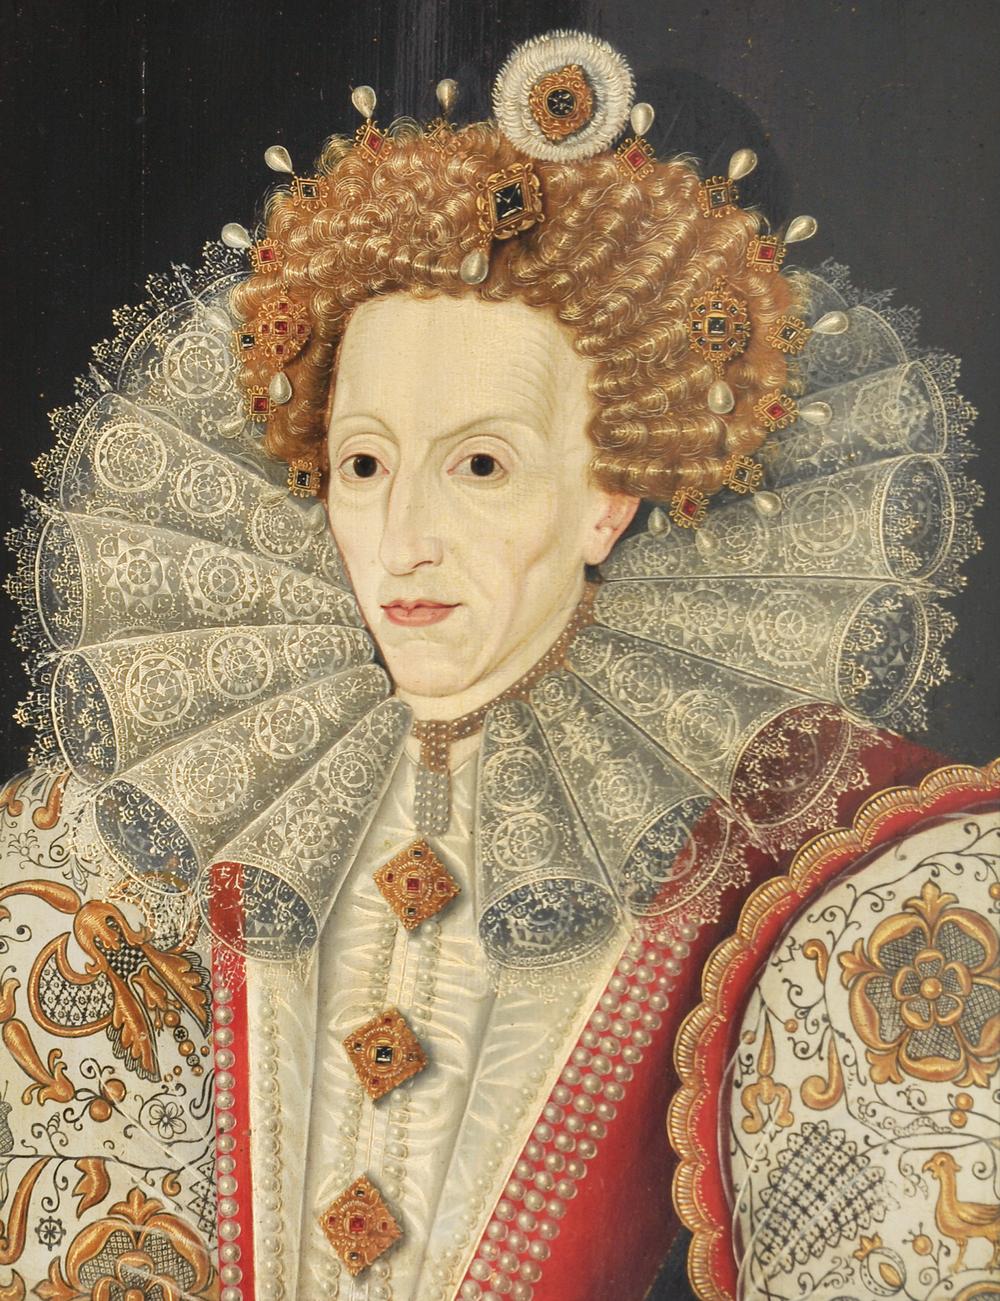 Ciphers, Secrets, and Spies in the Elizabethan Age - Presented by Carol Ann Lloyd